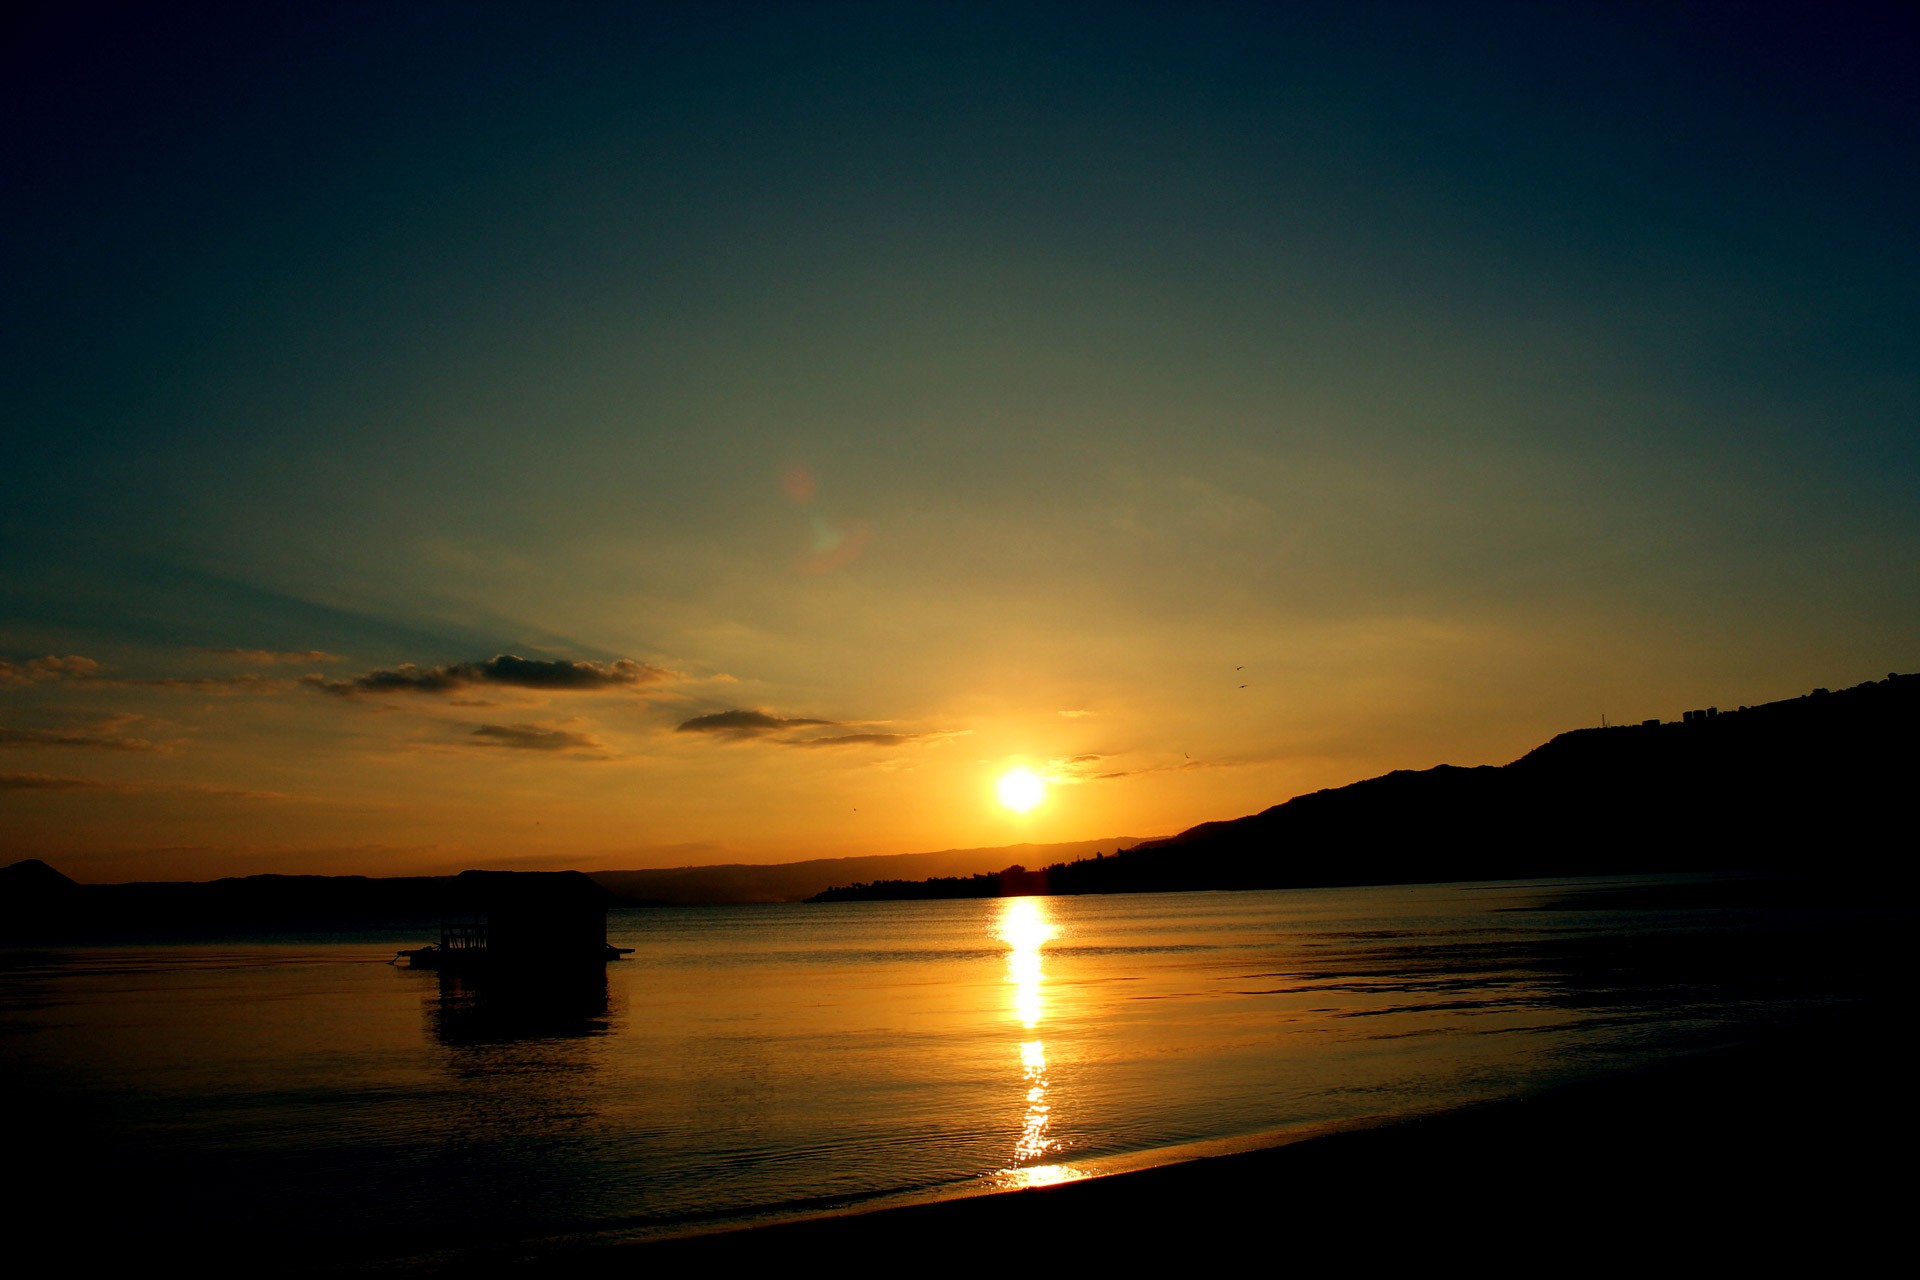 Beach At Beautiful Sunset Nature Background Royalty Free ospEUfRu